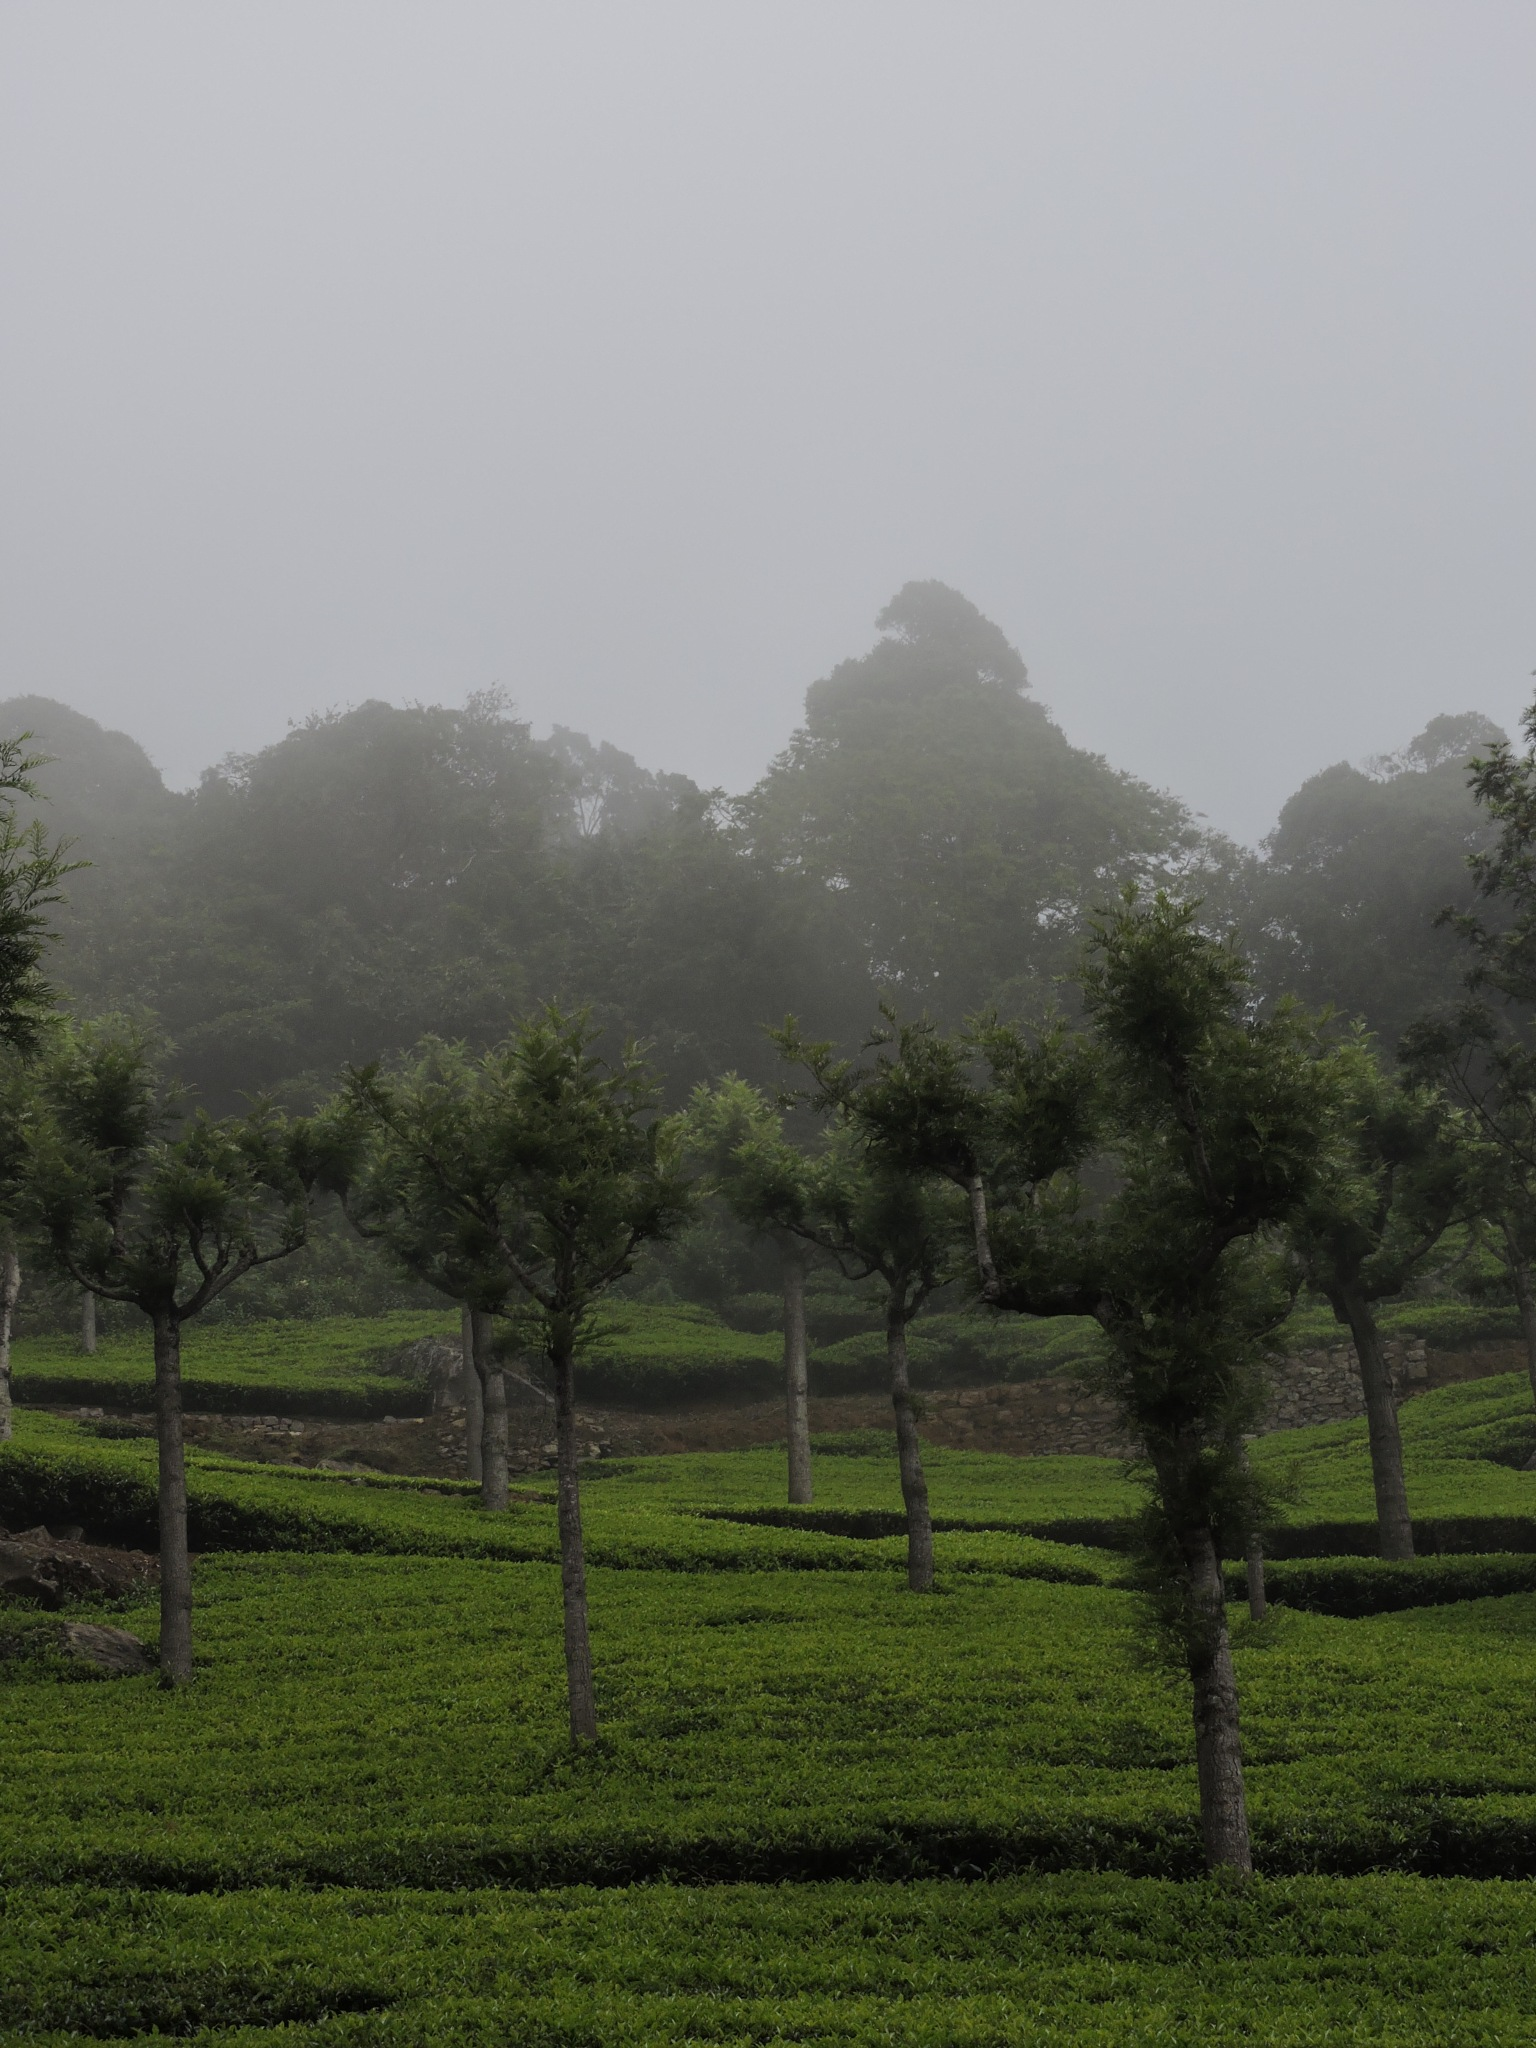 tea garden in Coonor, India  by annapoorna.sitaram